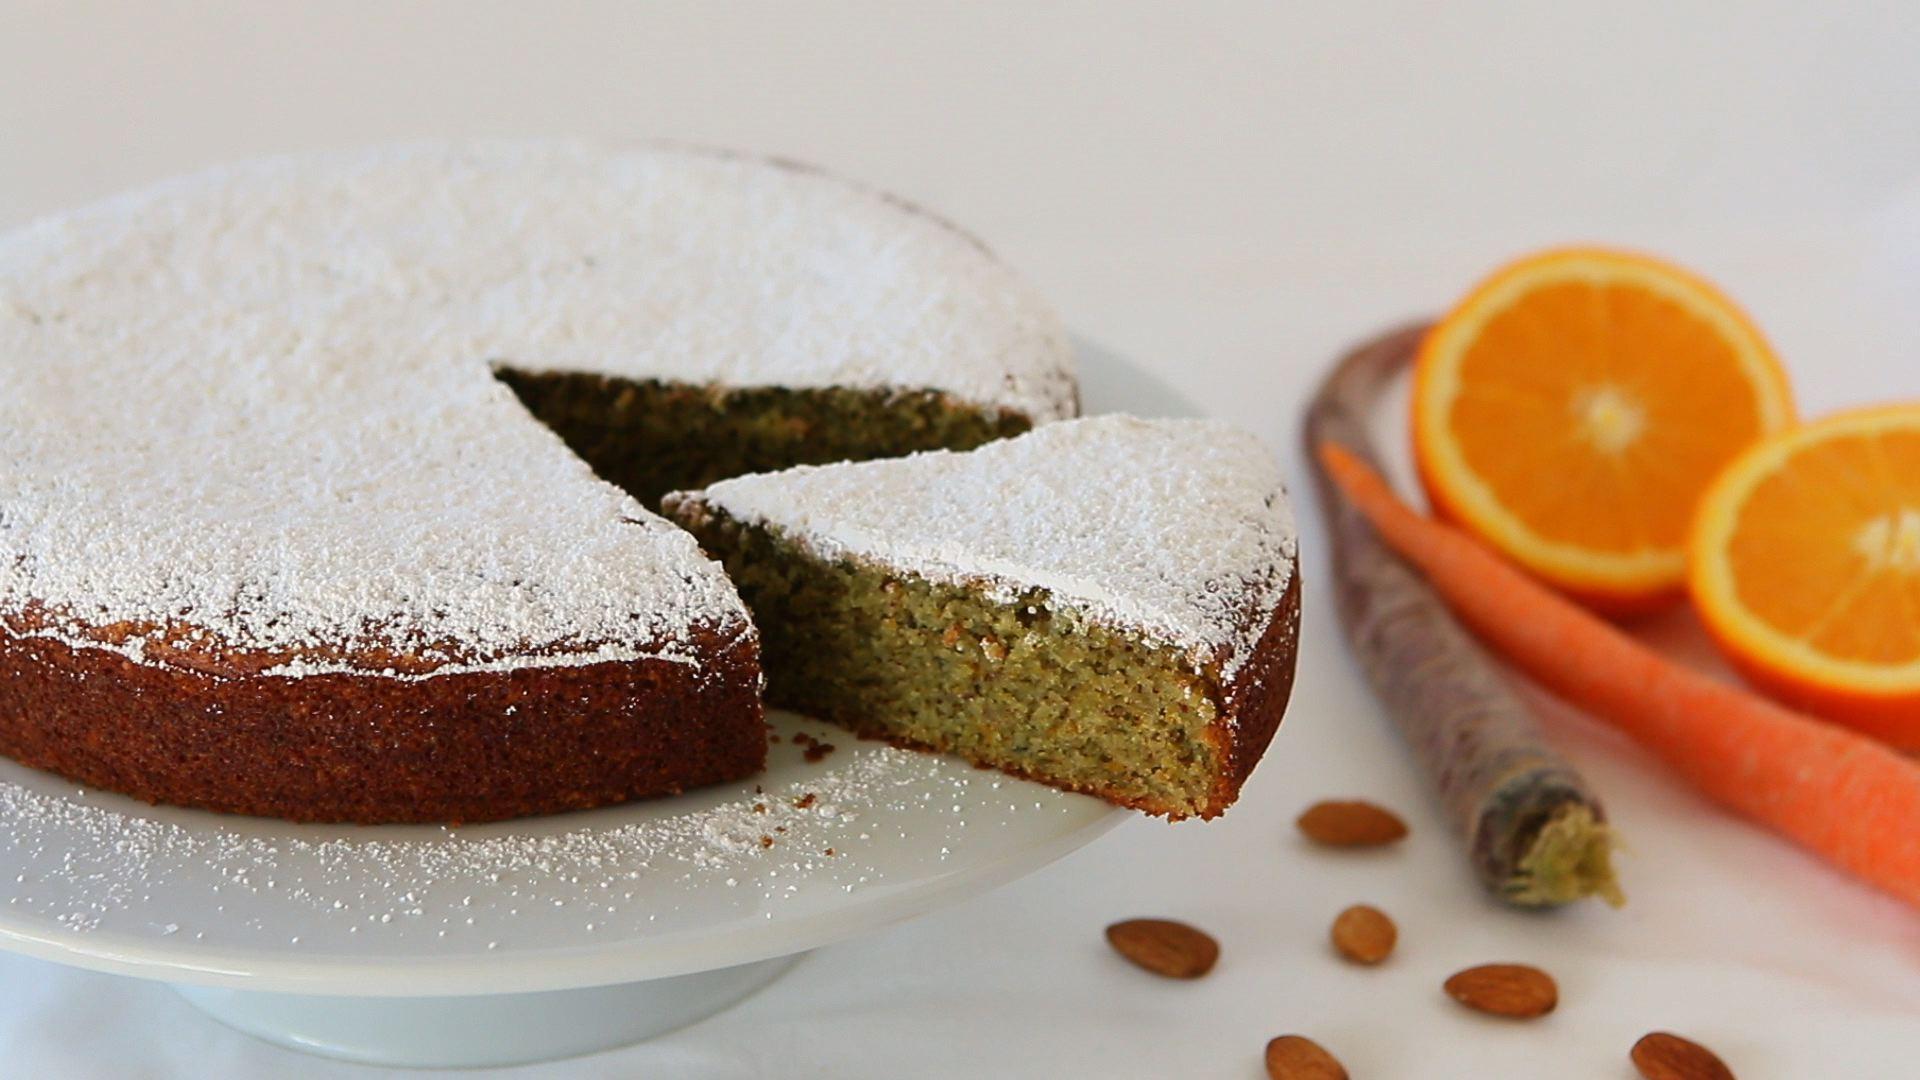 Easiest Vegan Gluten Free Carrot Cake Recipe With Pineapple